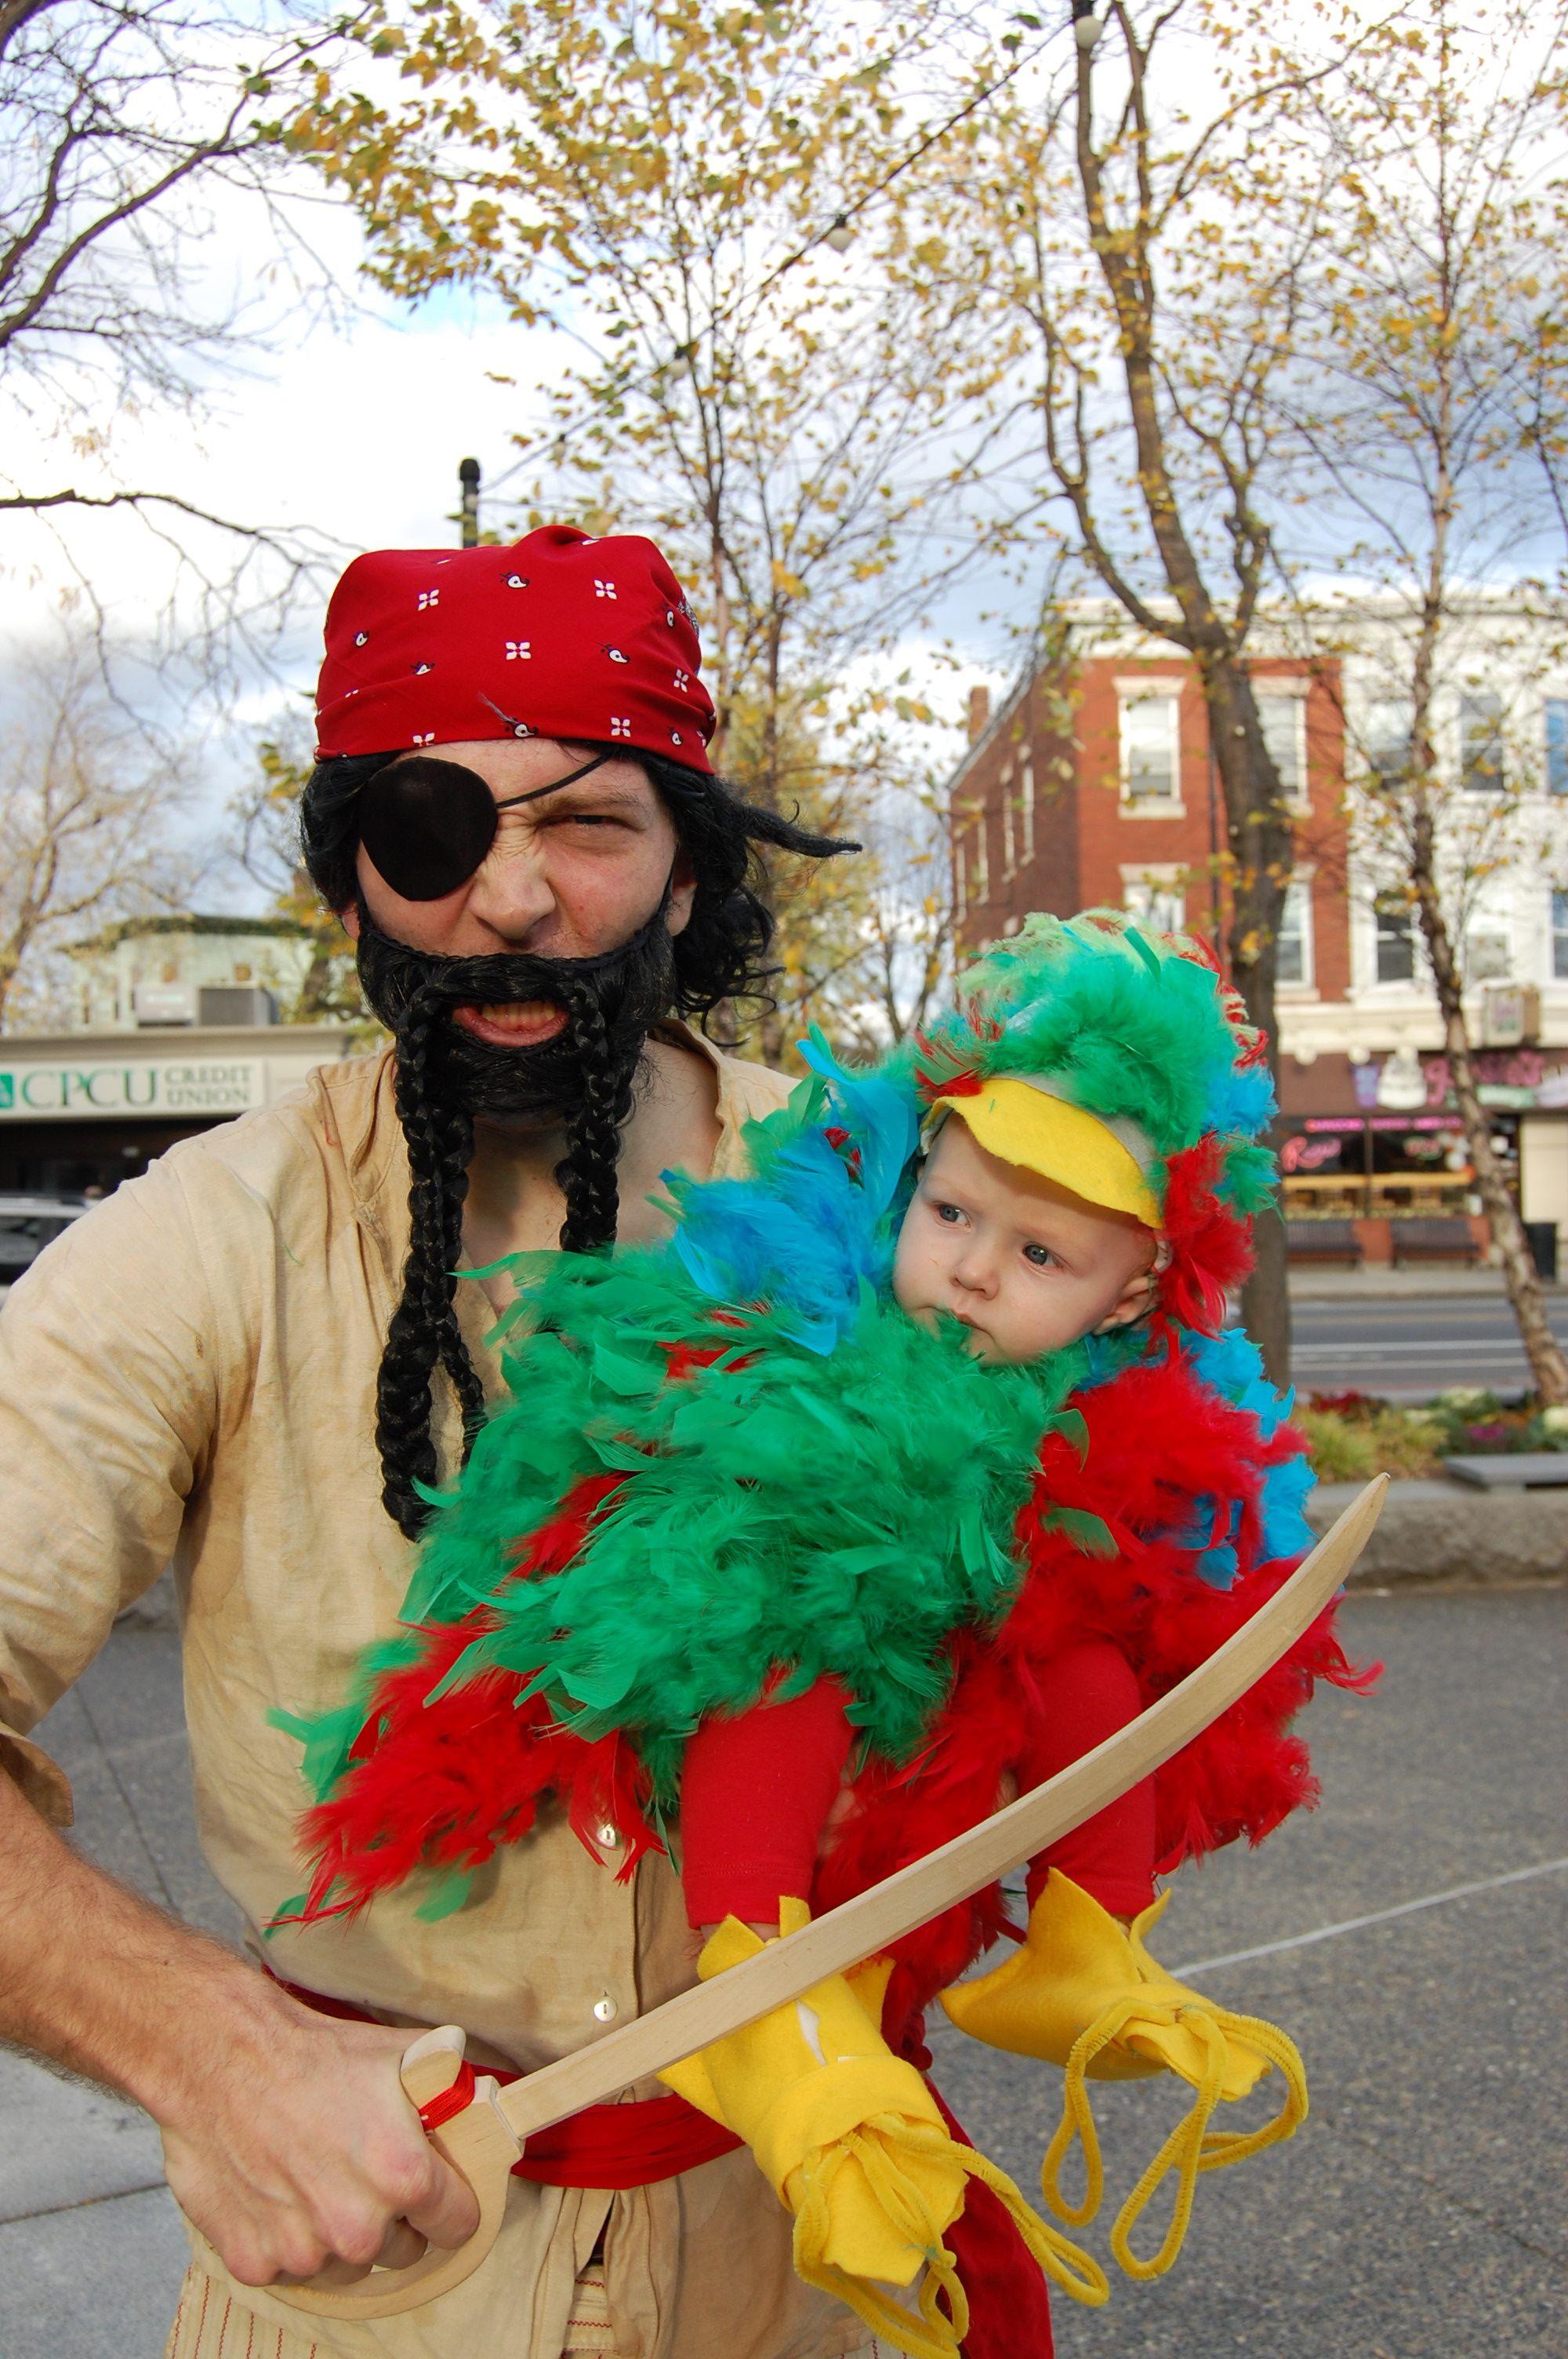 DIY Halloween Costume - Pirate u0026 his parrot  sc 1 st  Pinterest & DIY Halloween Costume - Pirate u0026 his parrot | fall | Pinterest ...